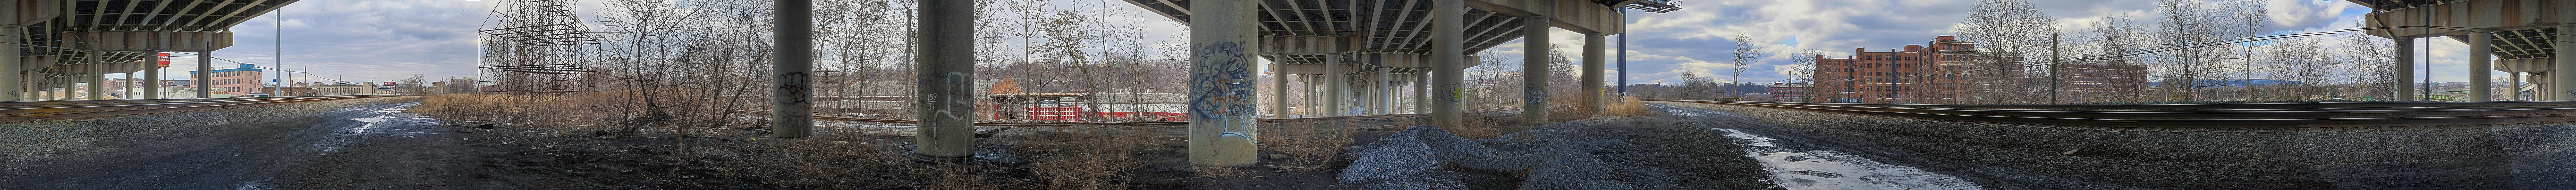 Panorama_Under890